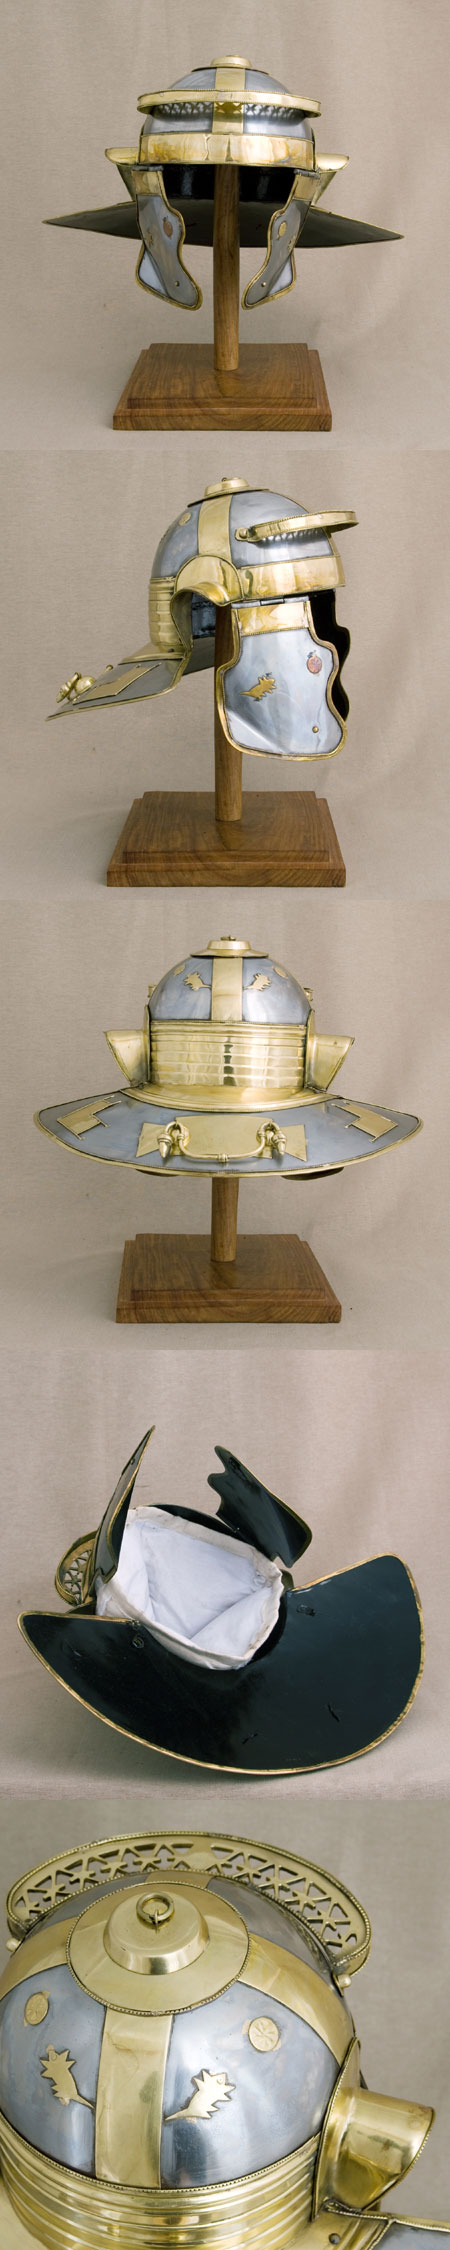 Römer Niedermörmter Helm, Deepeeka-Replika